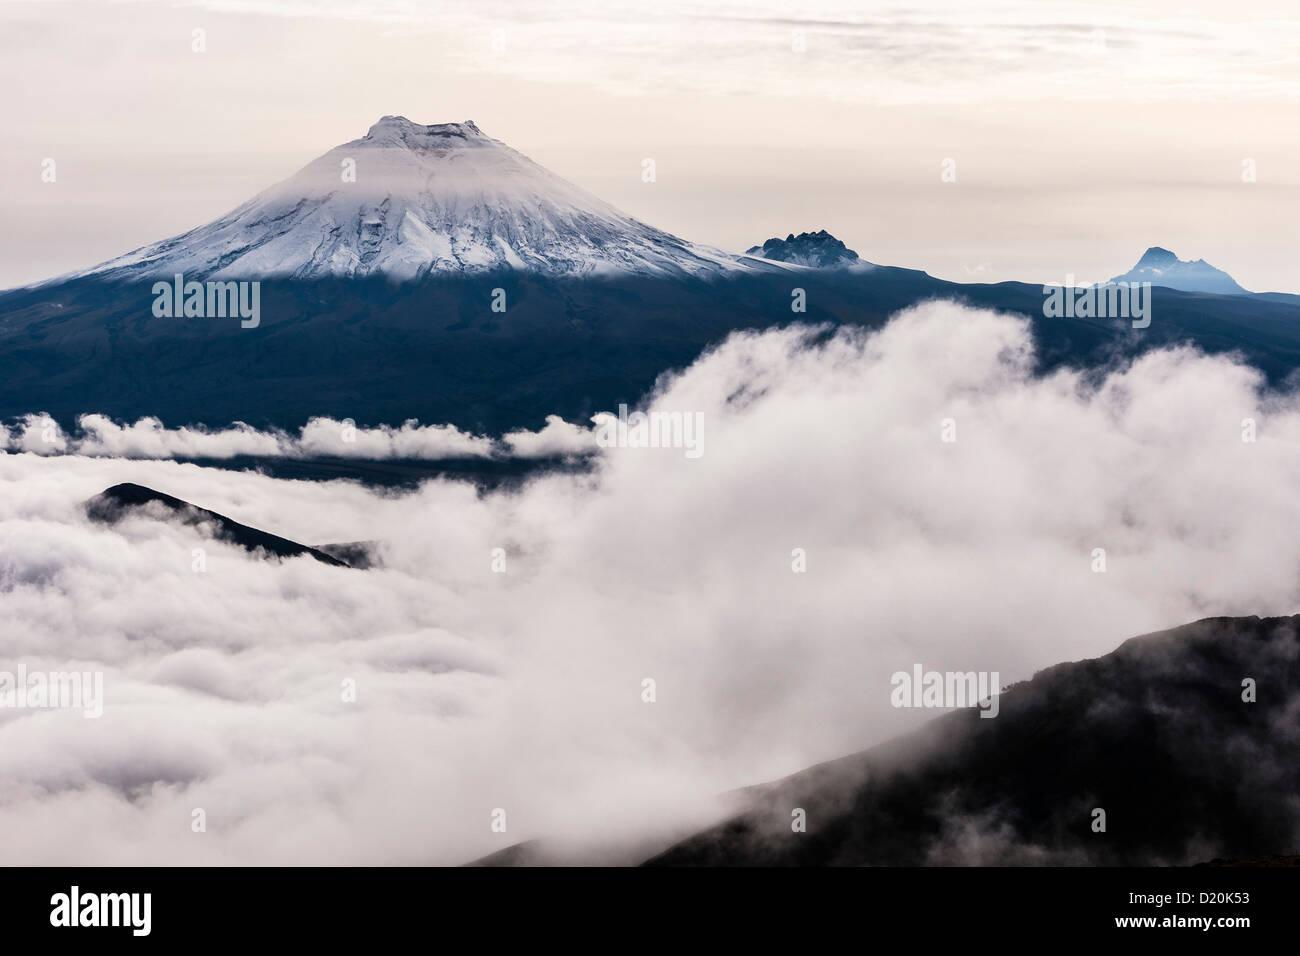 Vulkan Cotopaxi über Wolken, gesehen vom Los Illinizas, Ecuador, Südamerika Stockbild